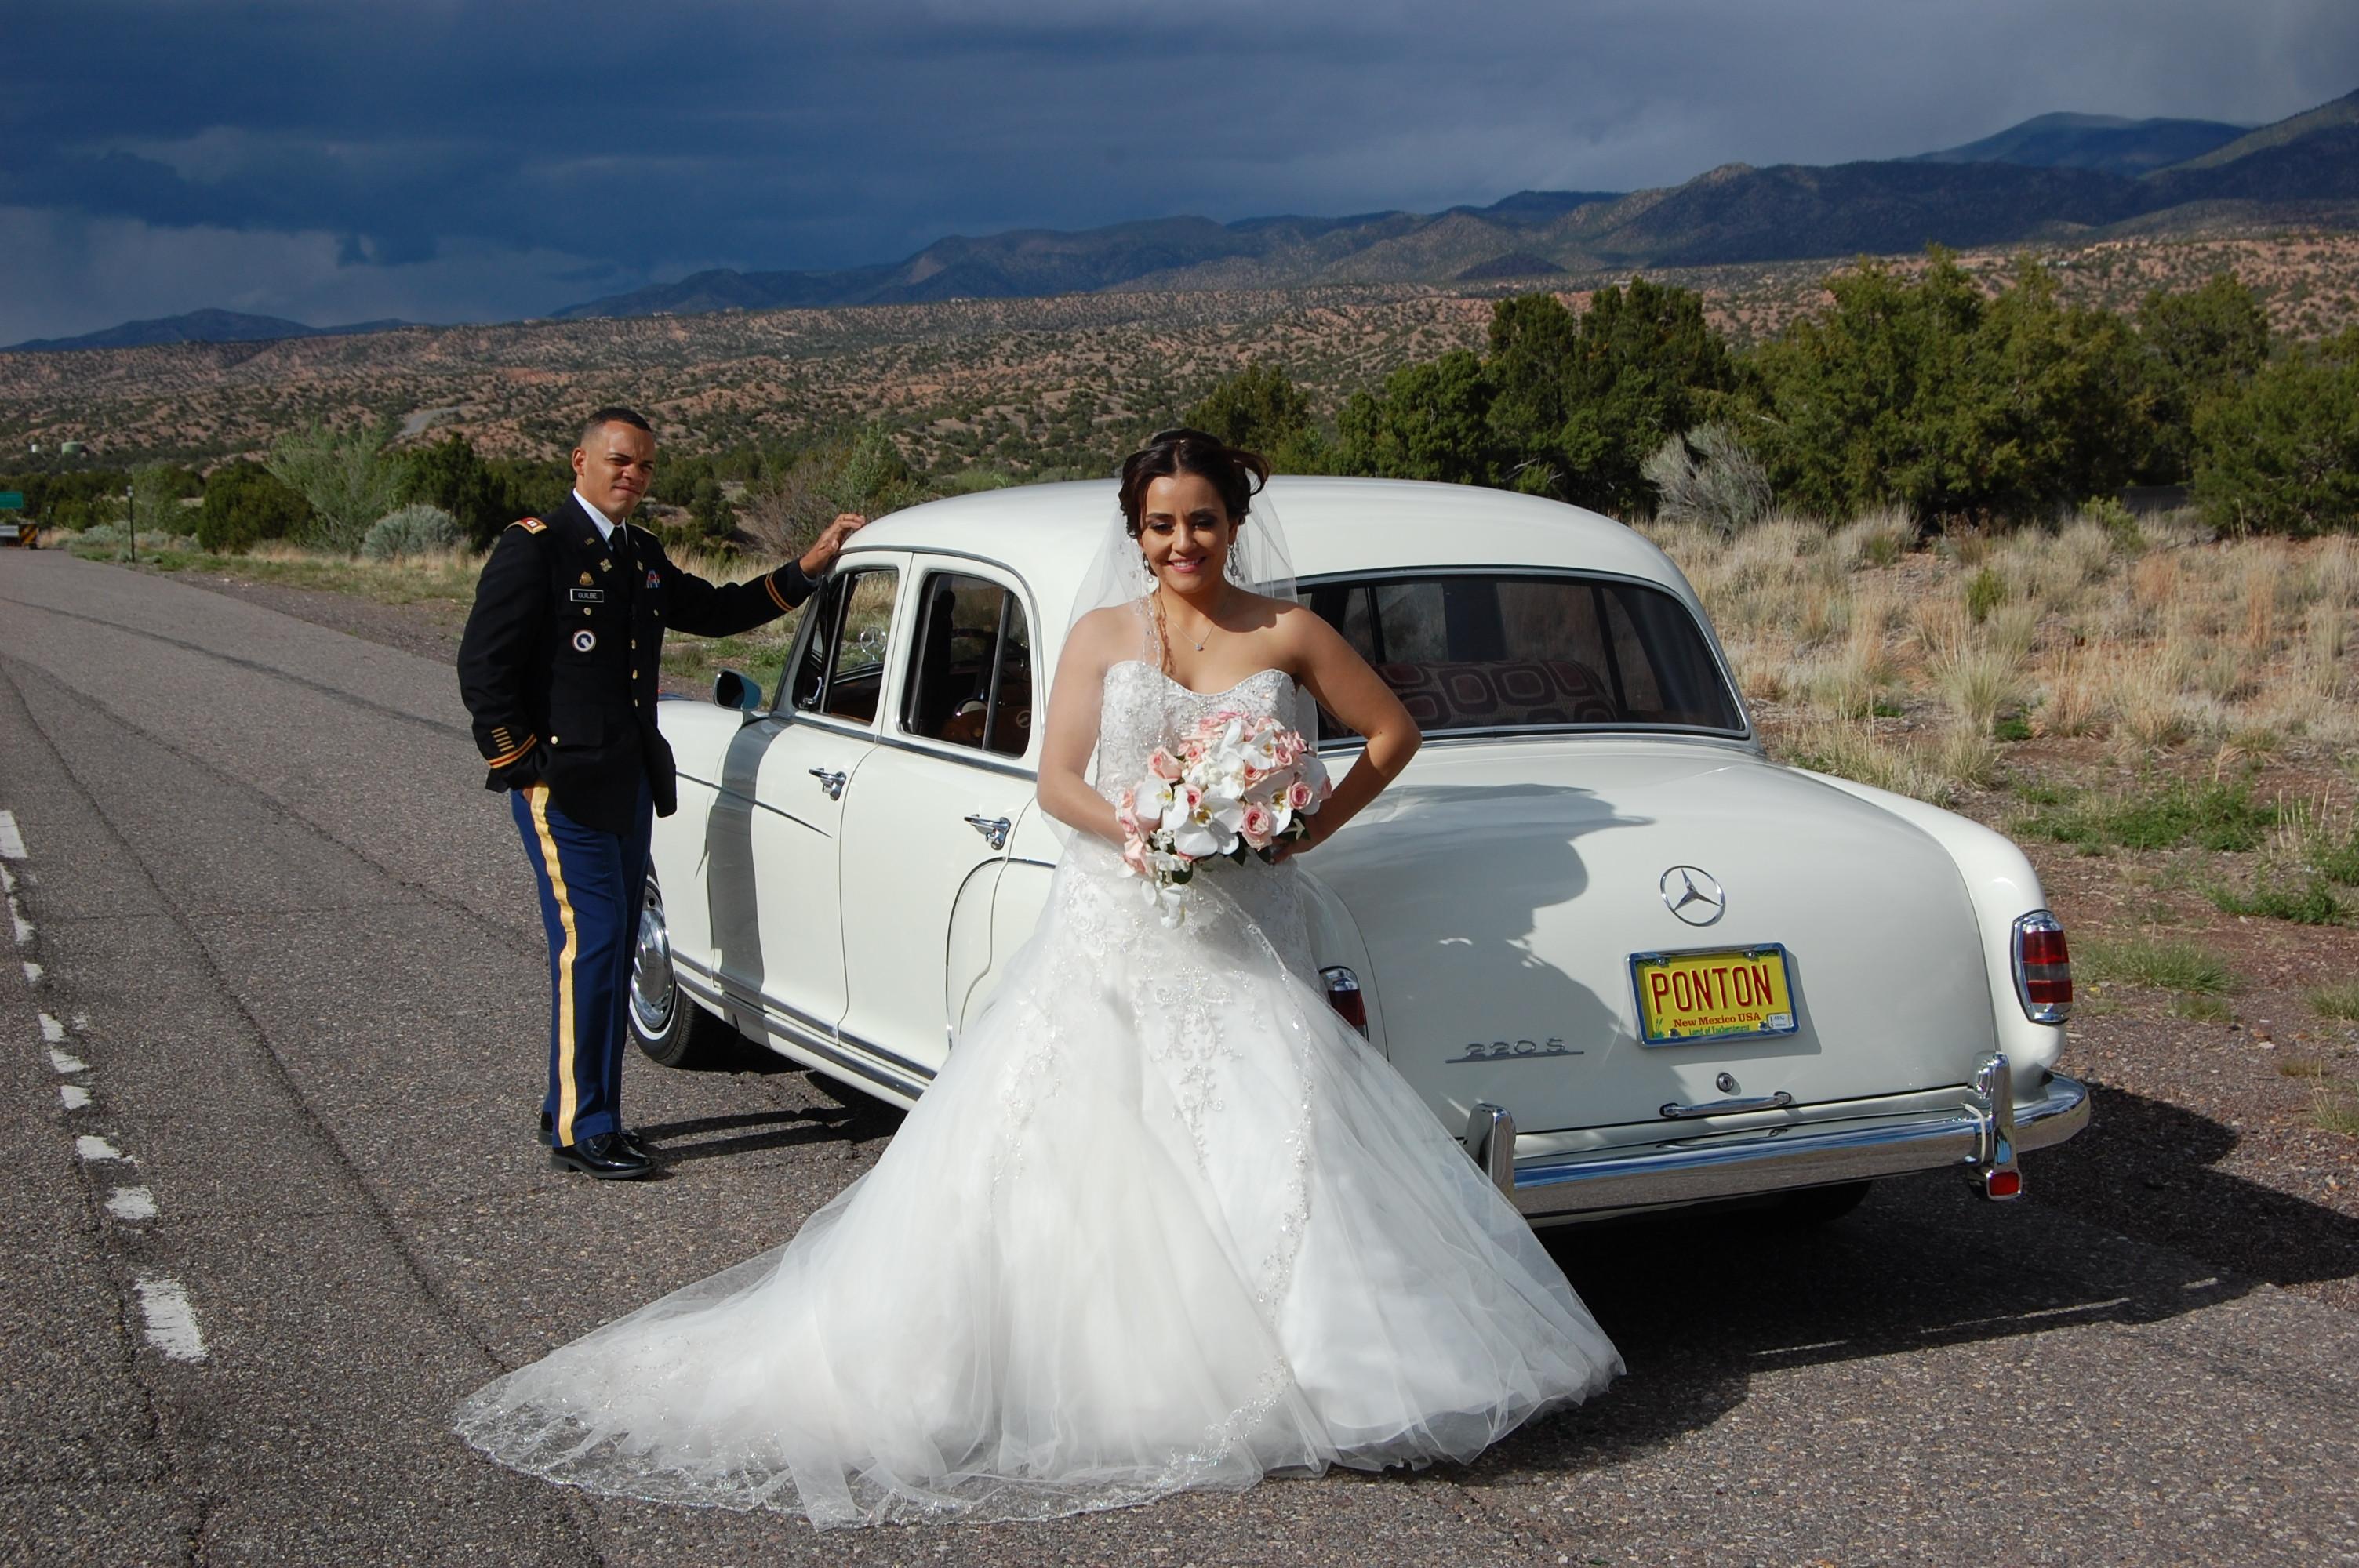 Mercedes-wedding-party-2015-0046-20-15